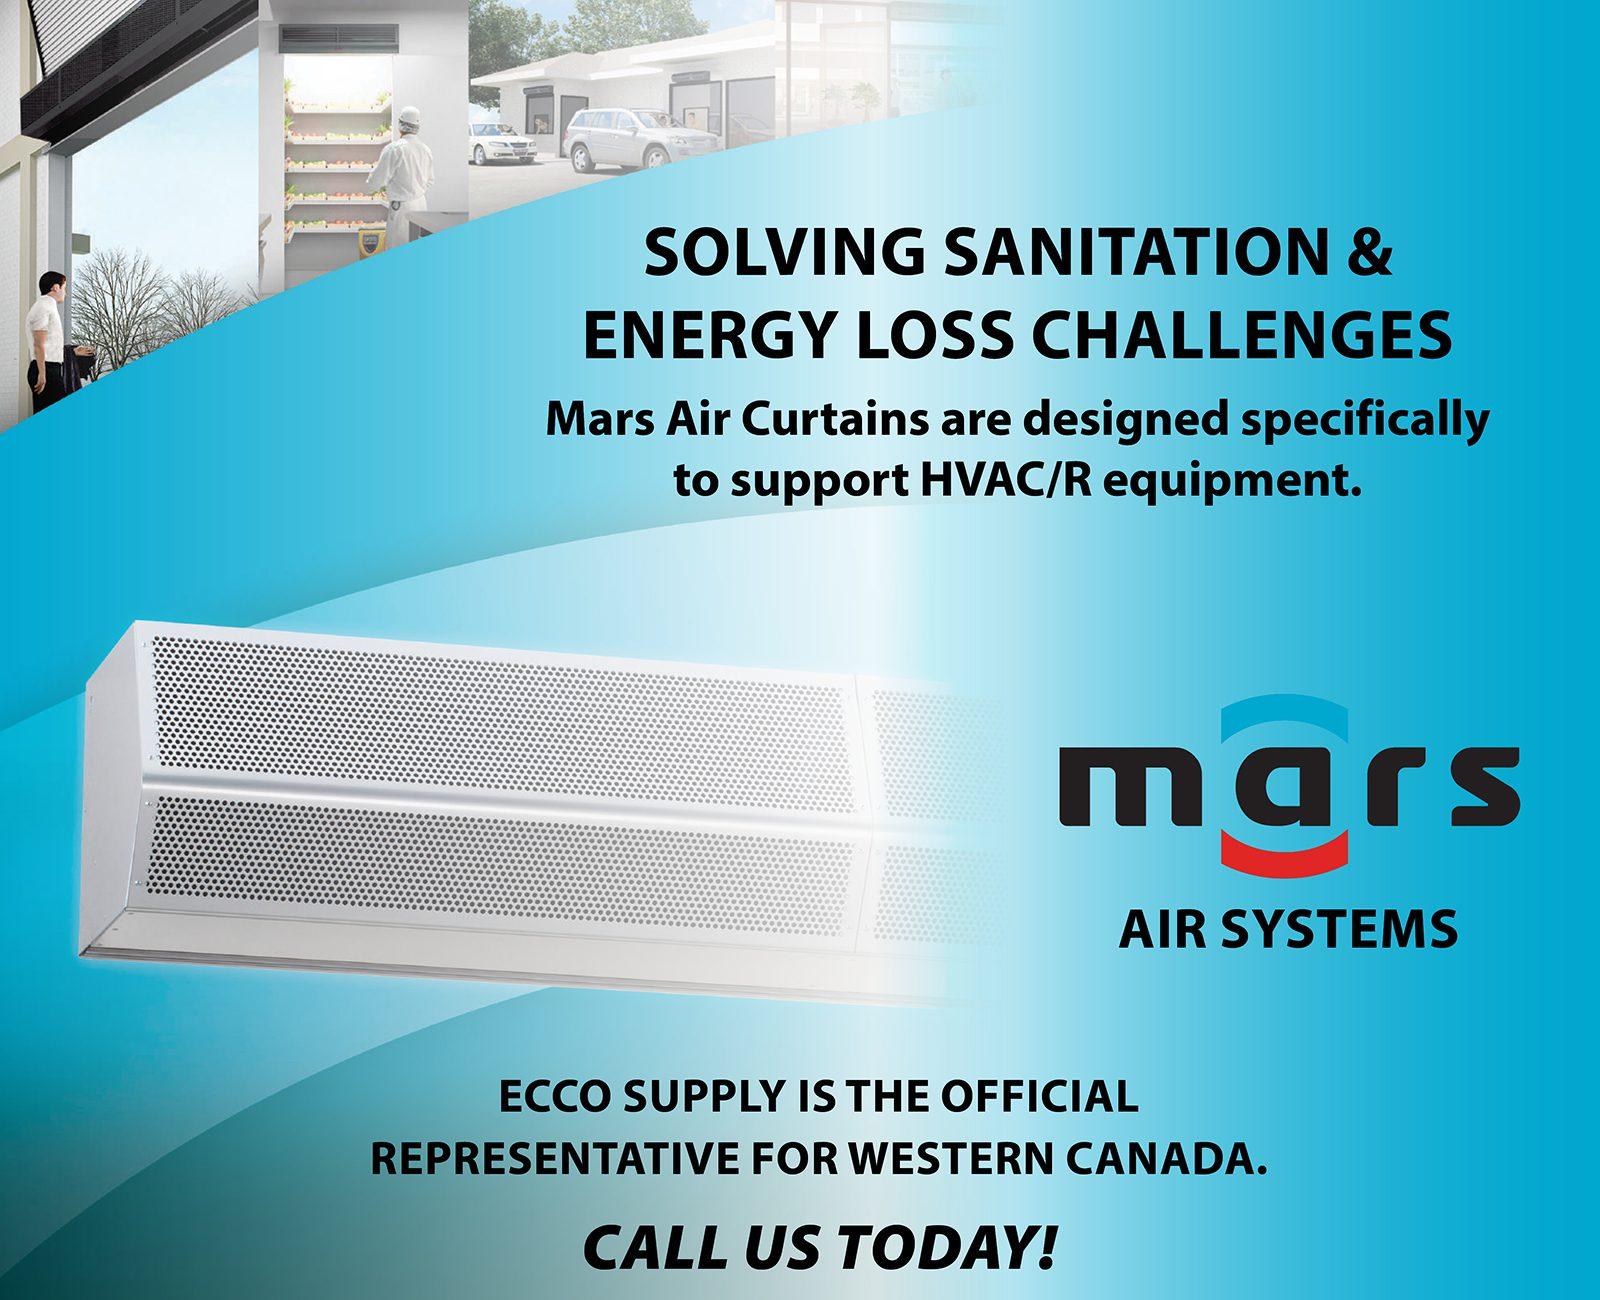 Mars air systems announcement